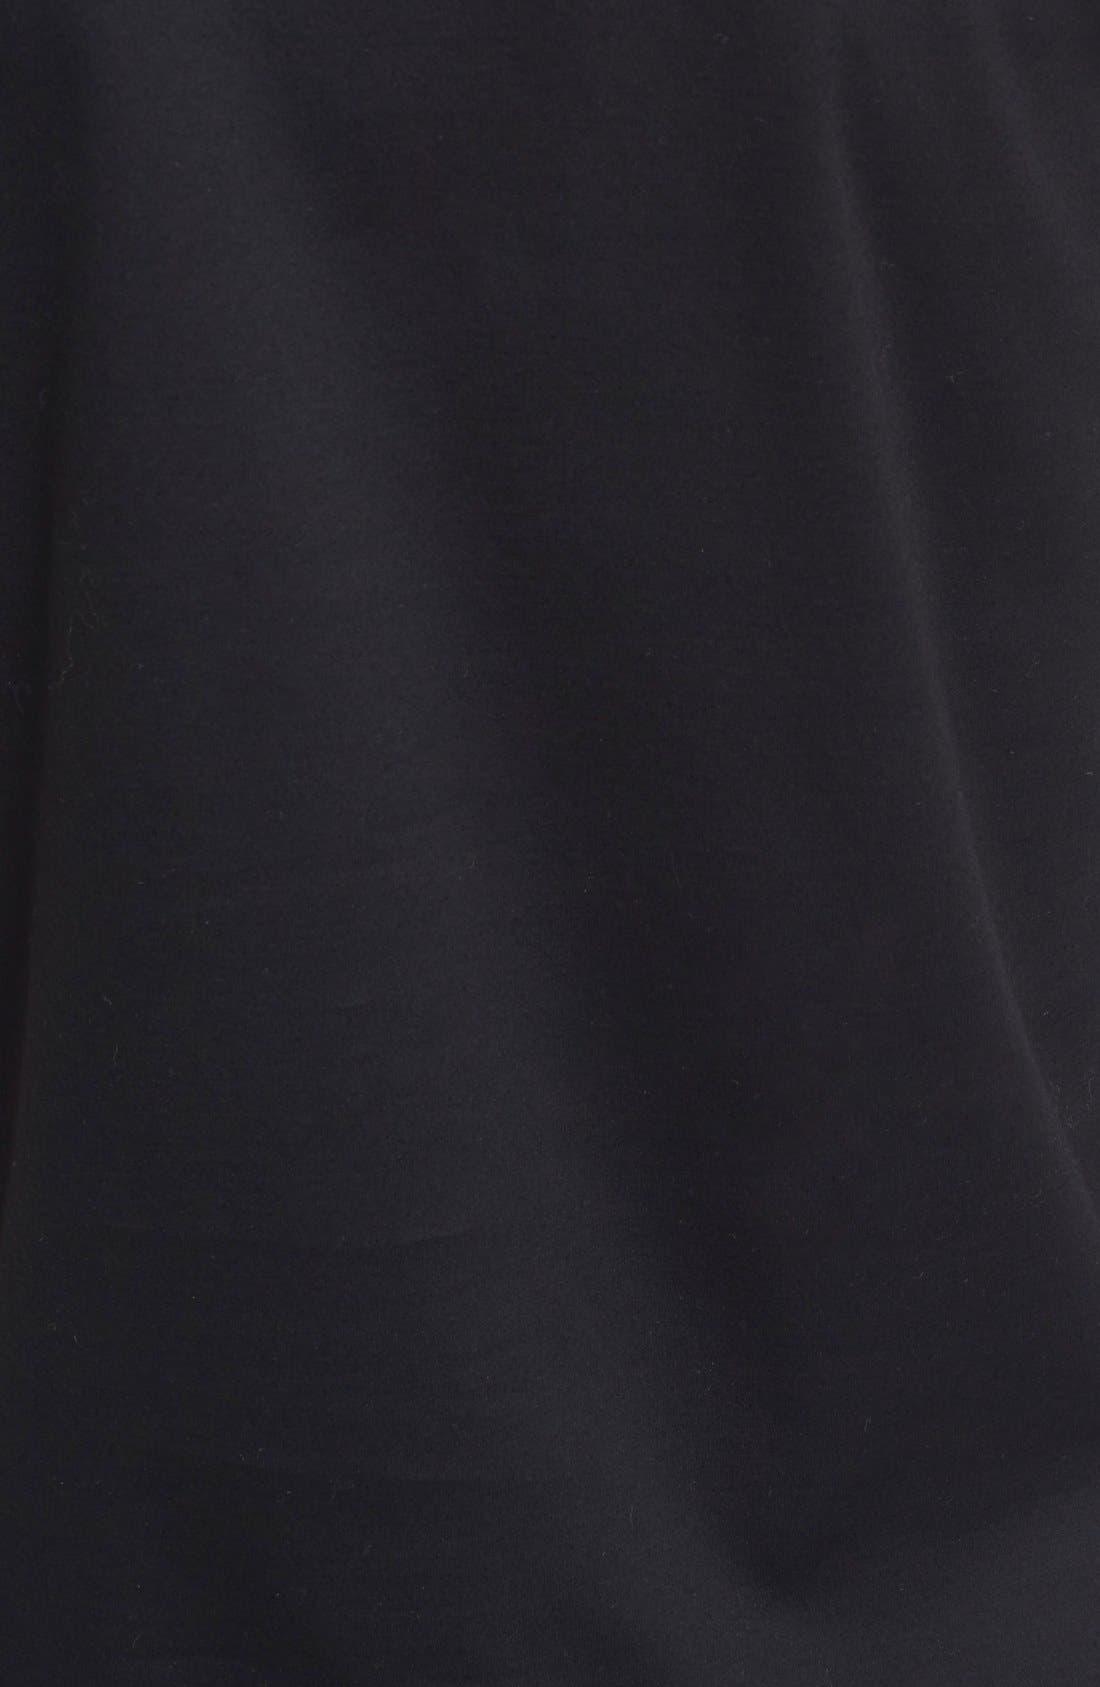 noir key ninomiya Cotton Tee with Frilled Bows,                             Alternate thumbnail 3, color,                             001